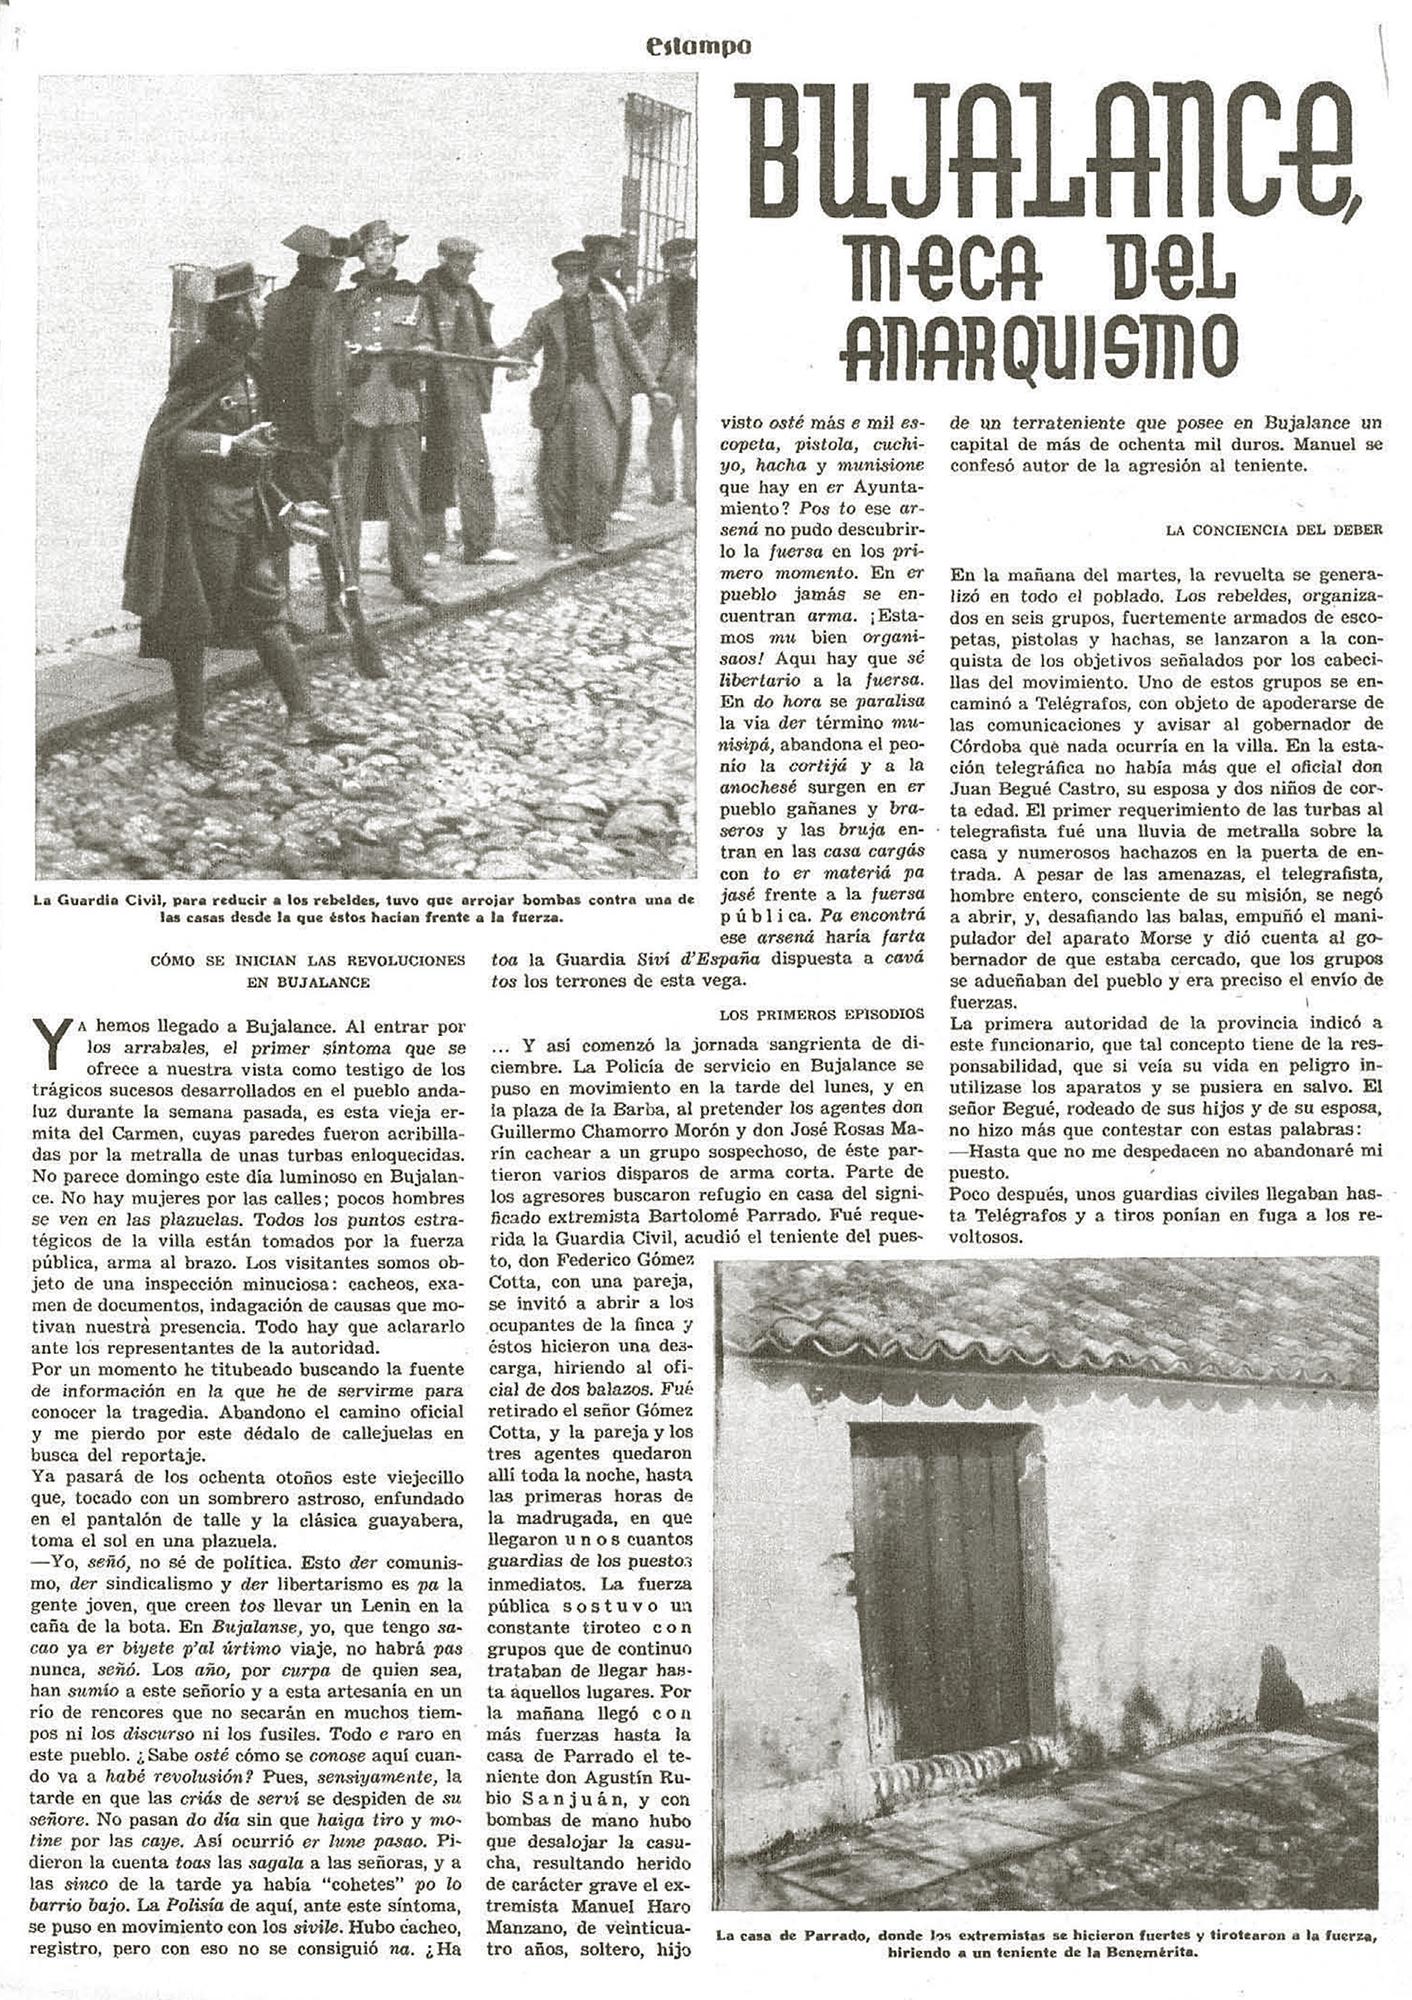 Bujalance 1933 Estampa p1